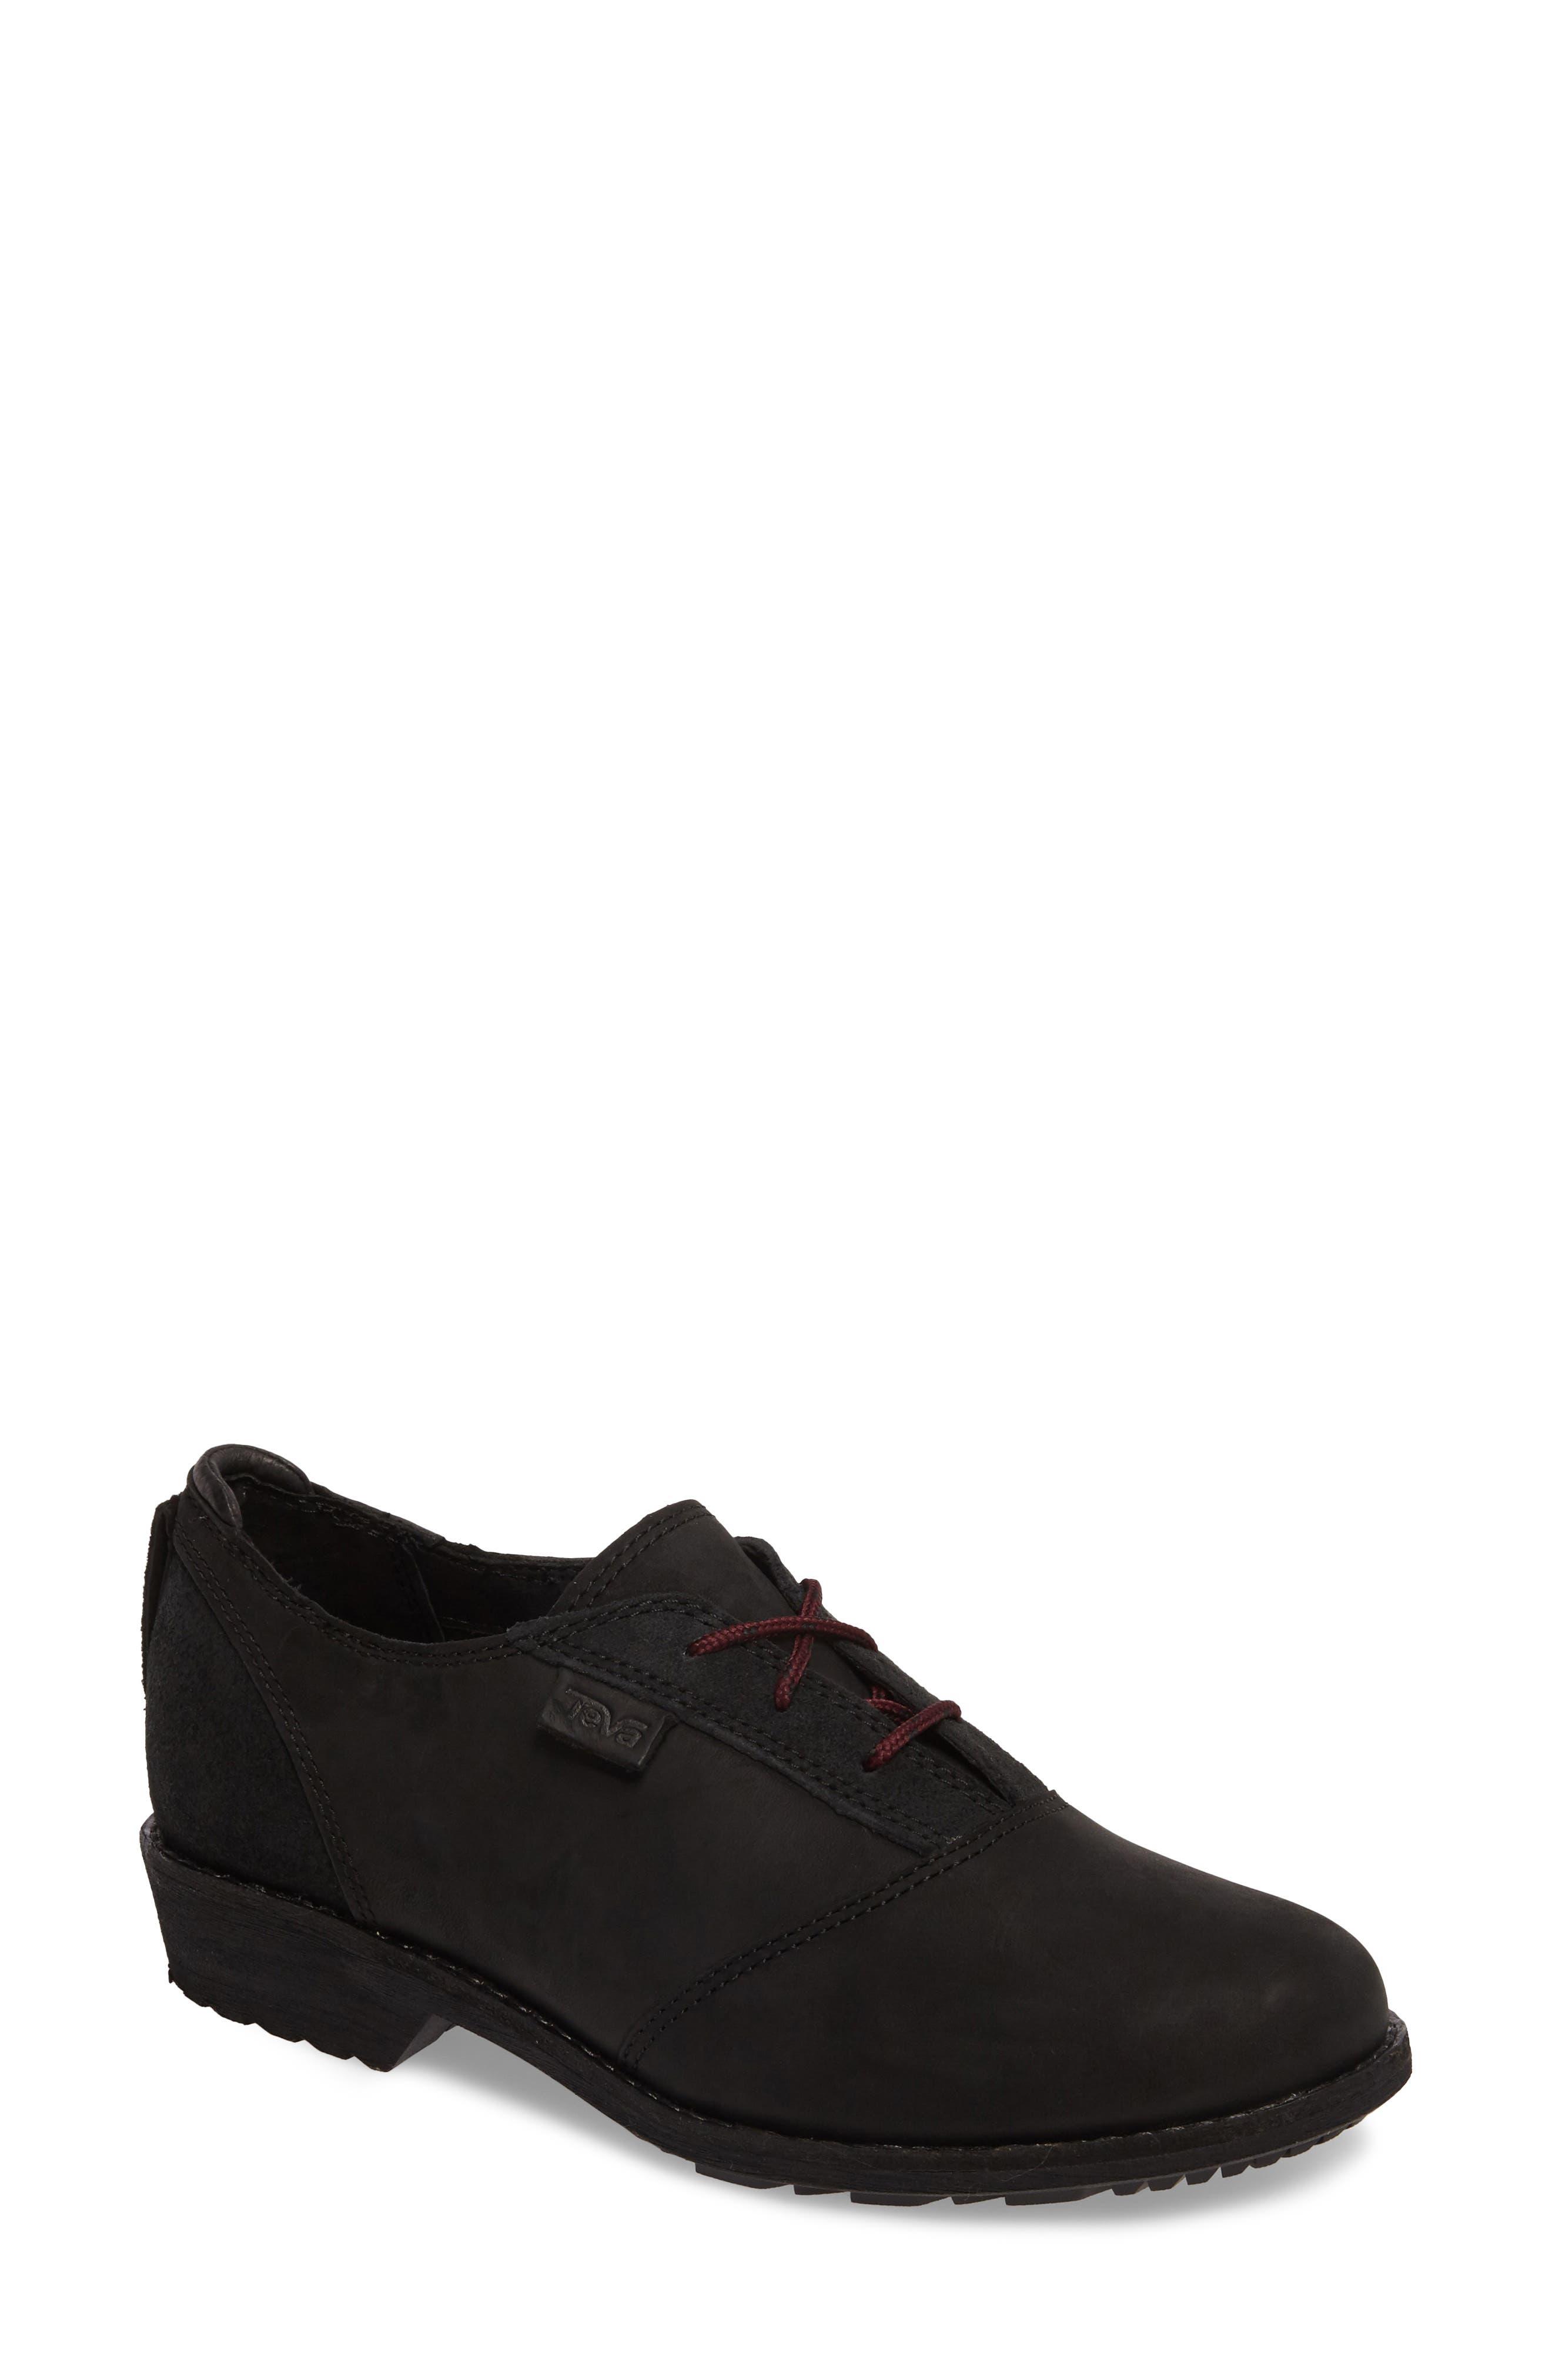 De La Vina Dos Waterproof Sneaker,                             Main thumbnail 1, color,                             001